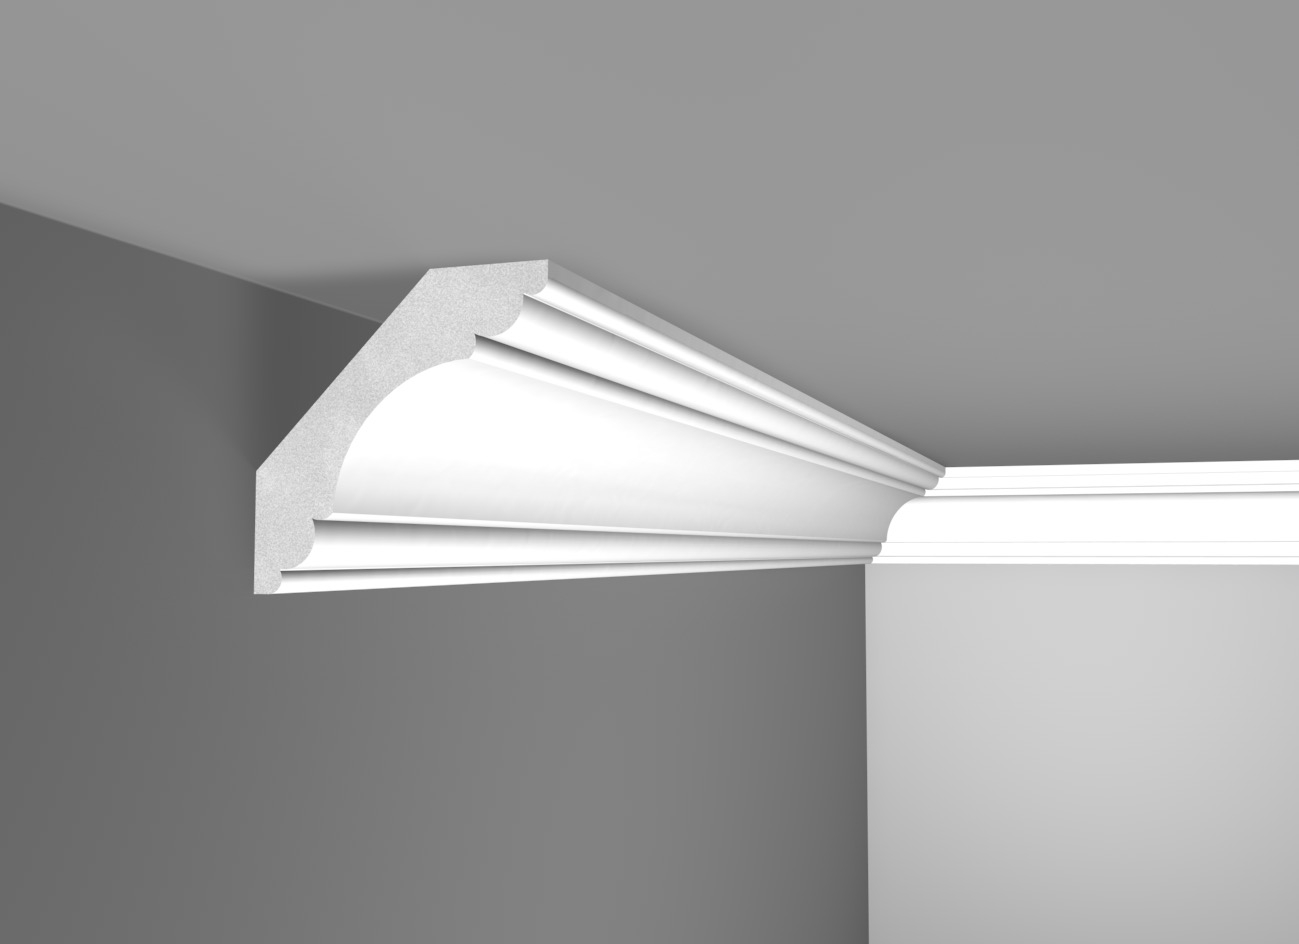 G 101 - Cornice in polistirene gessato bianco